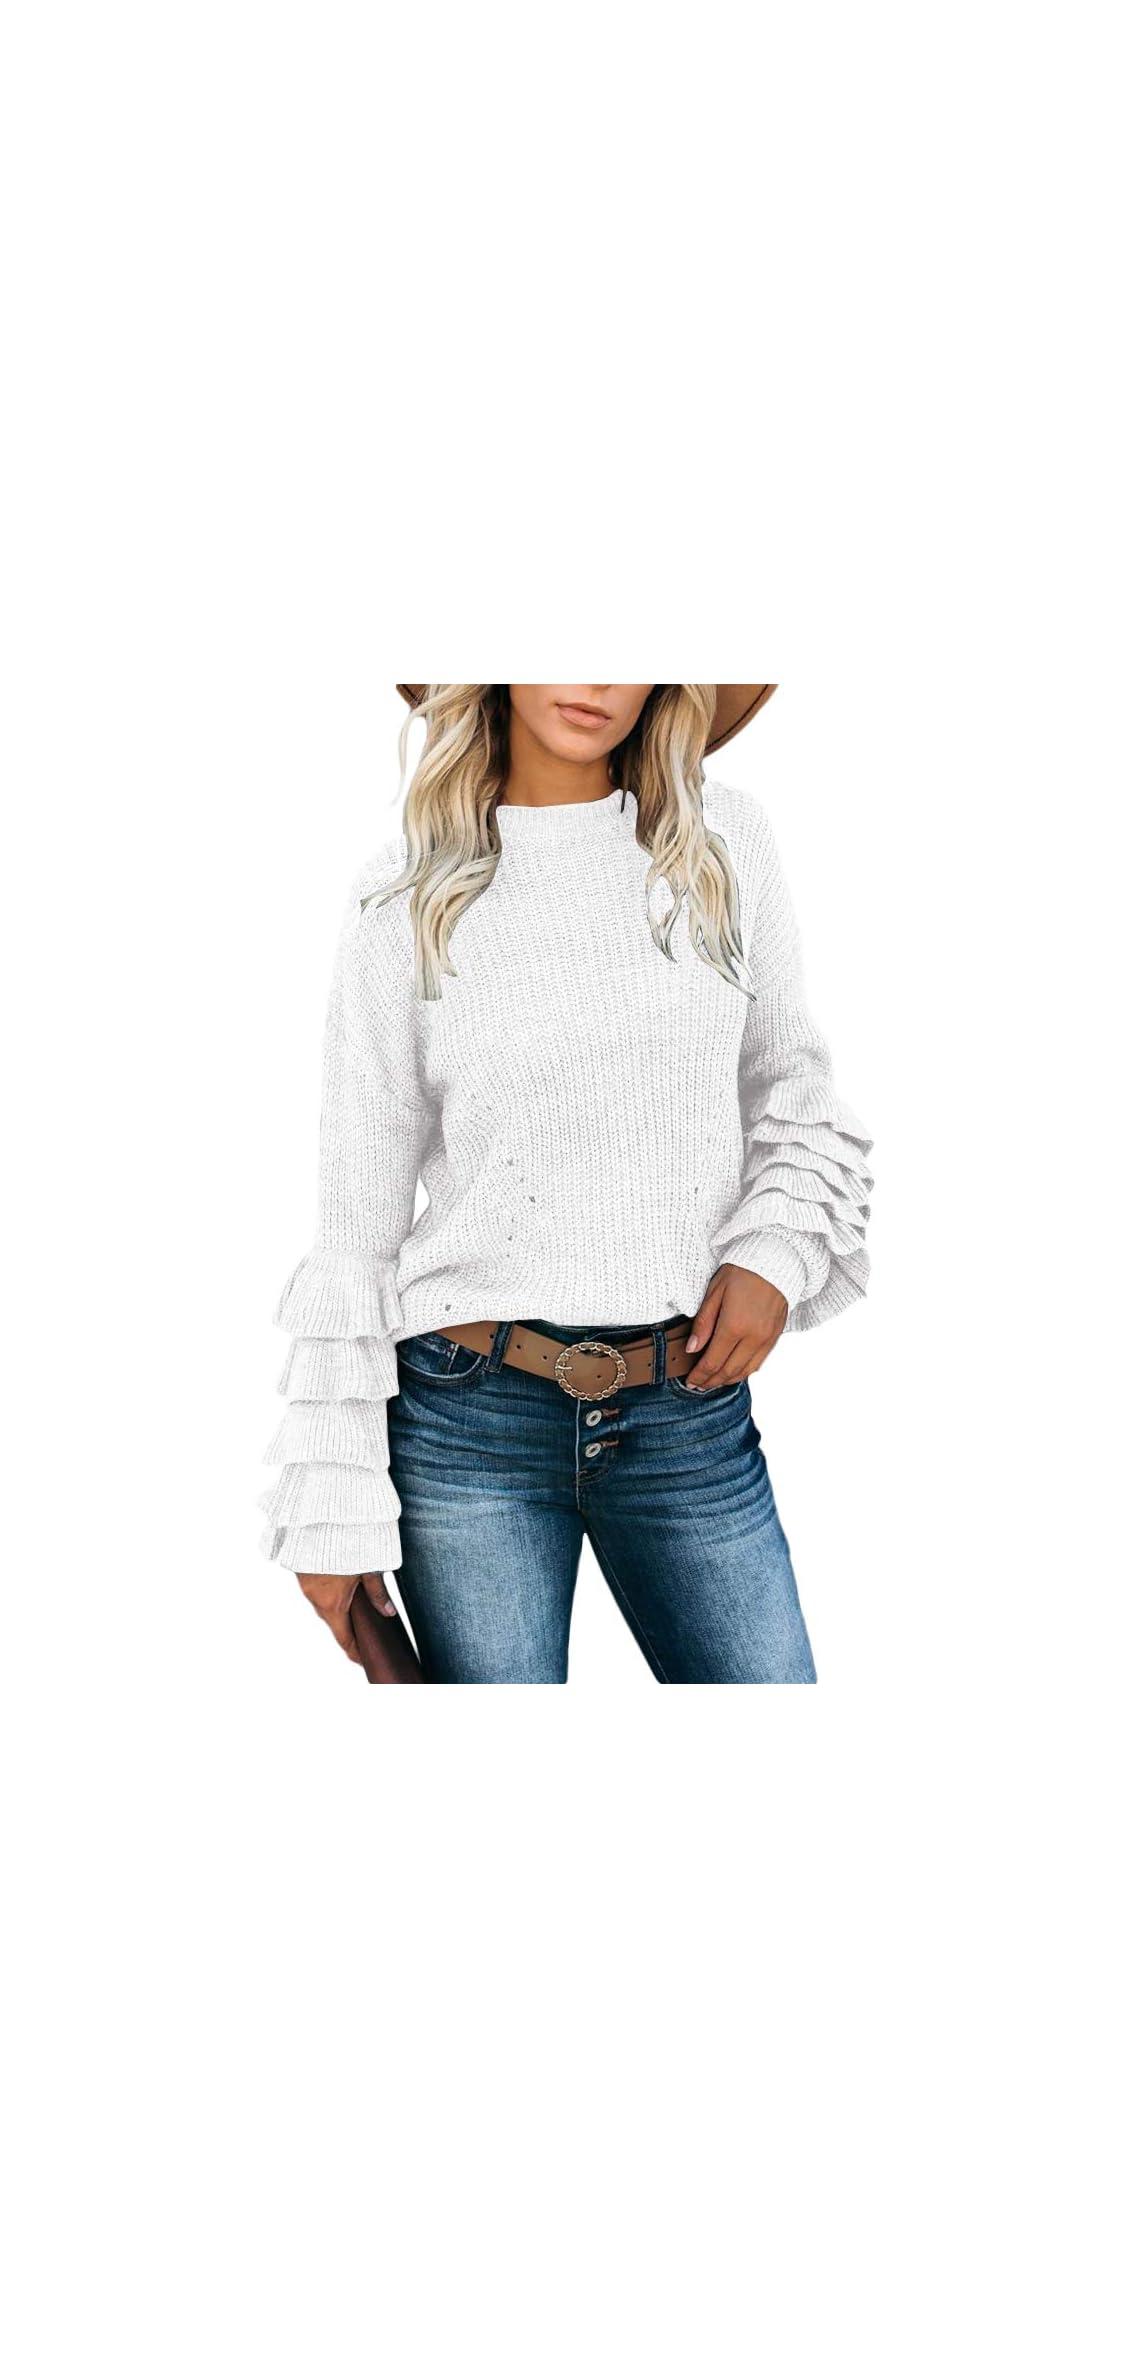 Womens Ruffle Layers Sweatshirt Puff Sleeves Drop Top